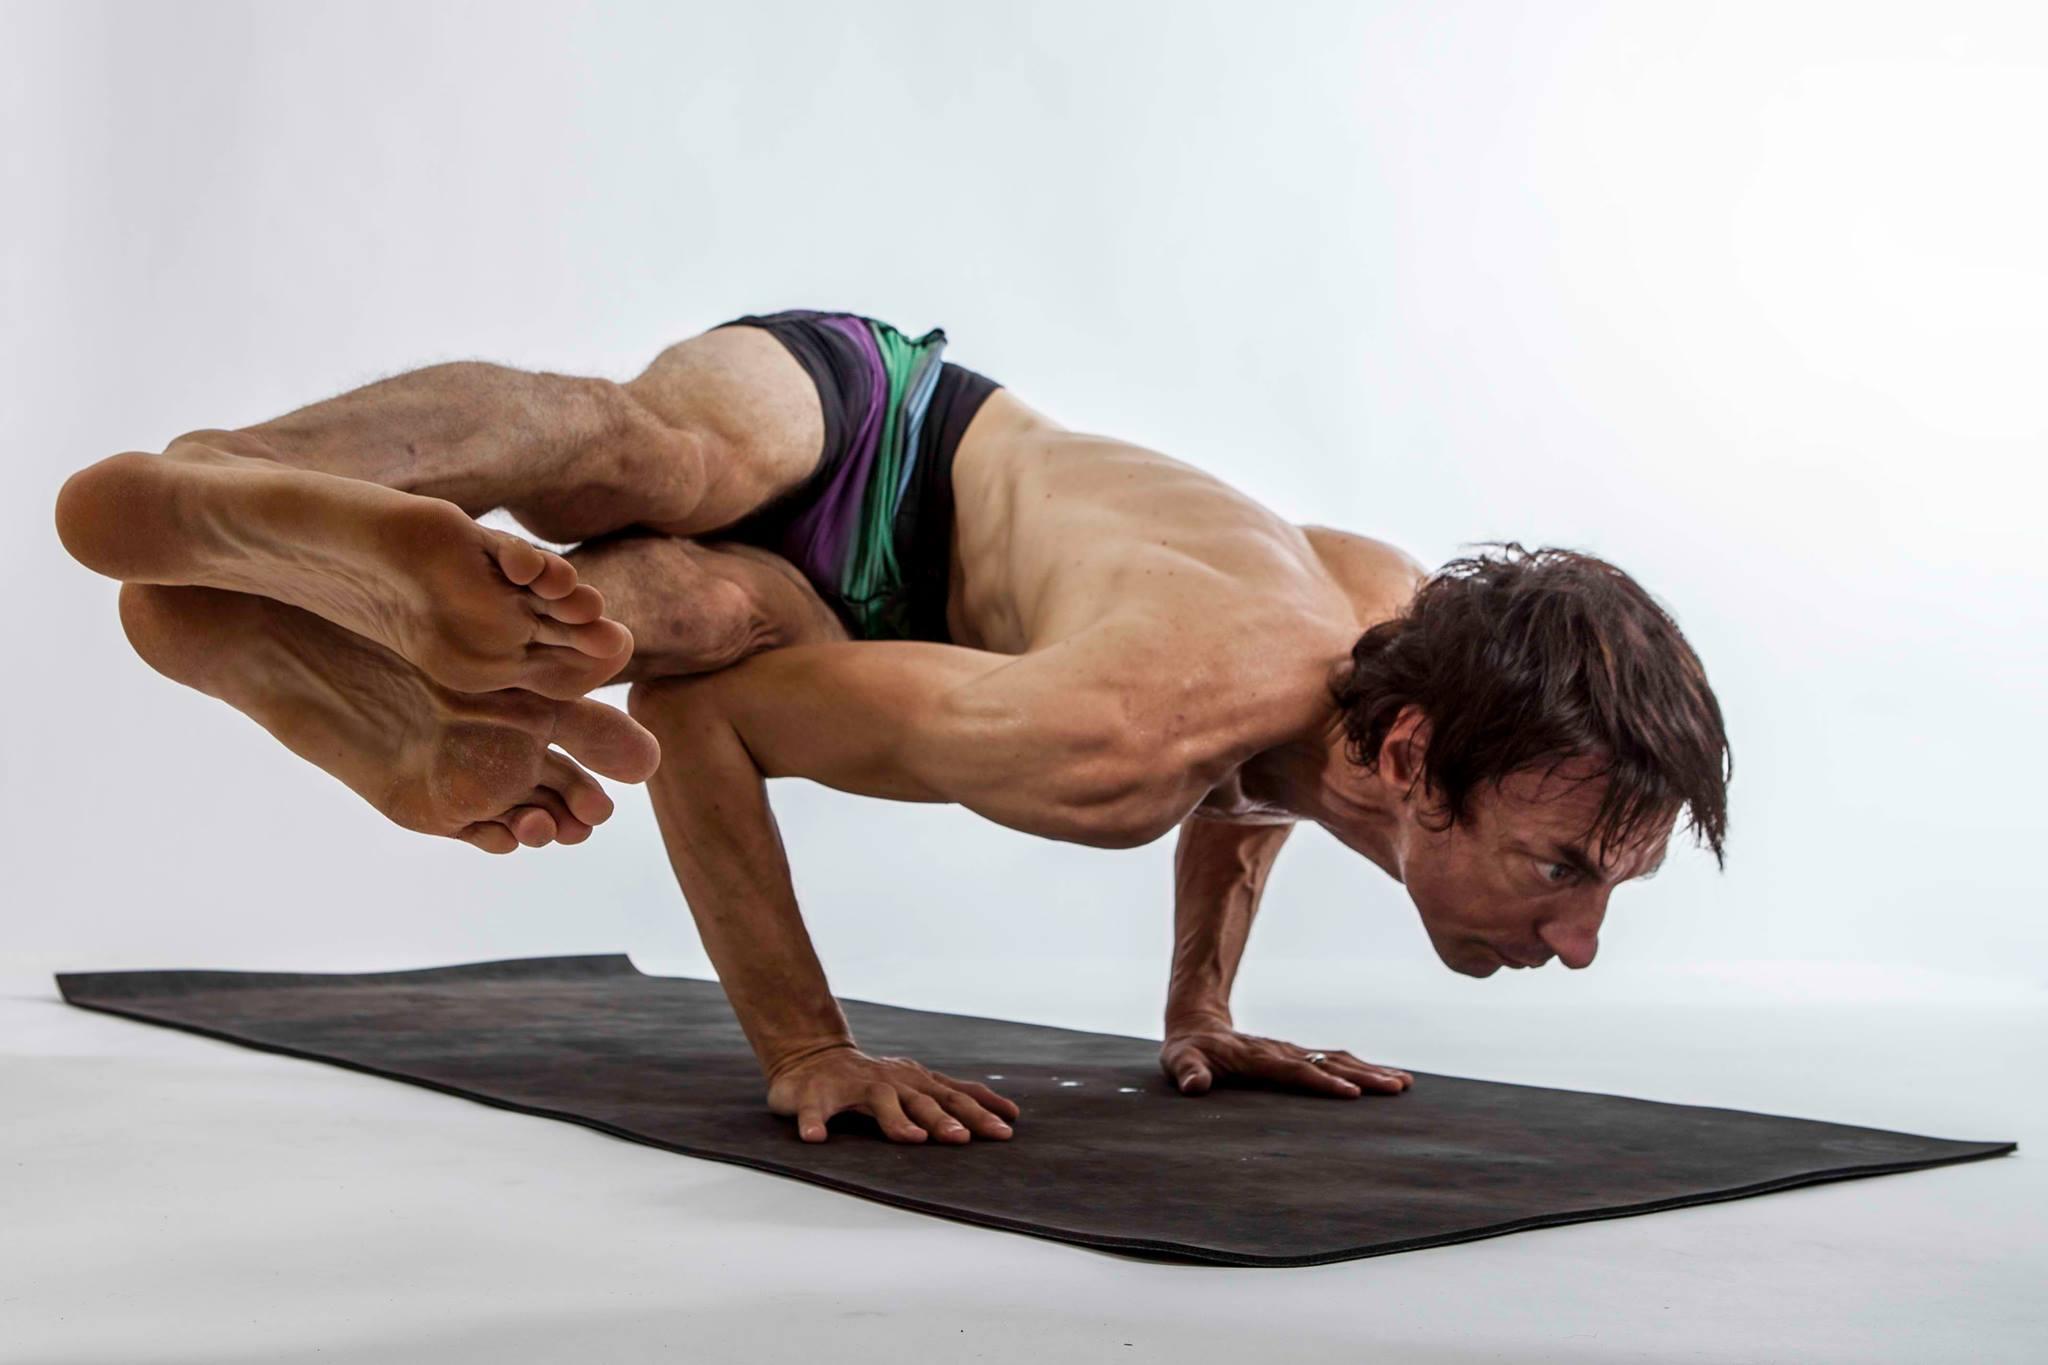 Do we need the beautiful Yoga photo?